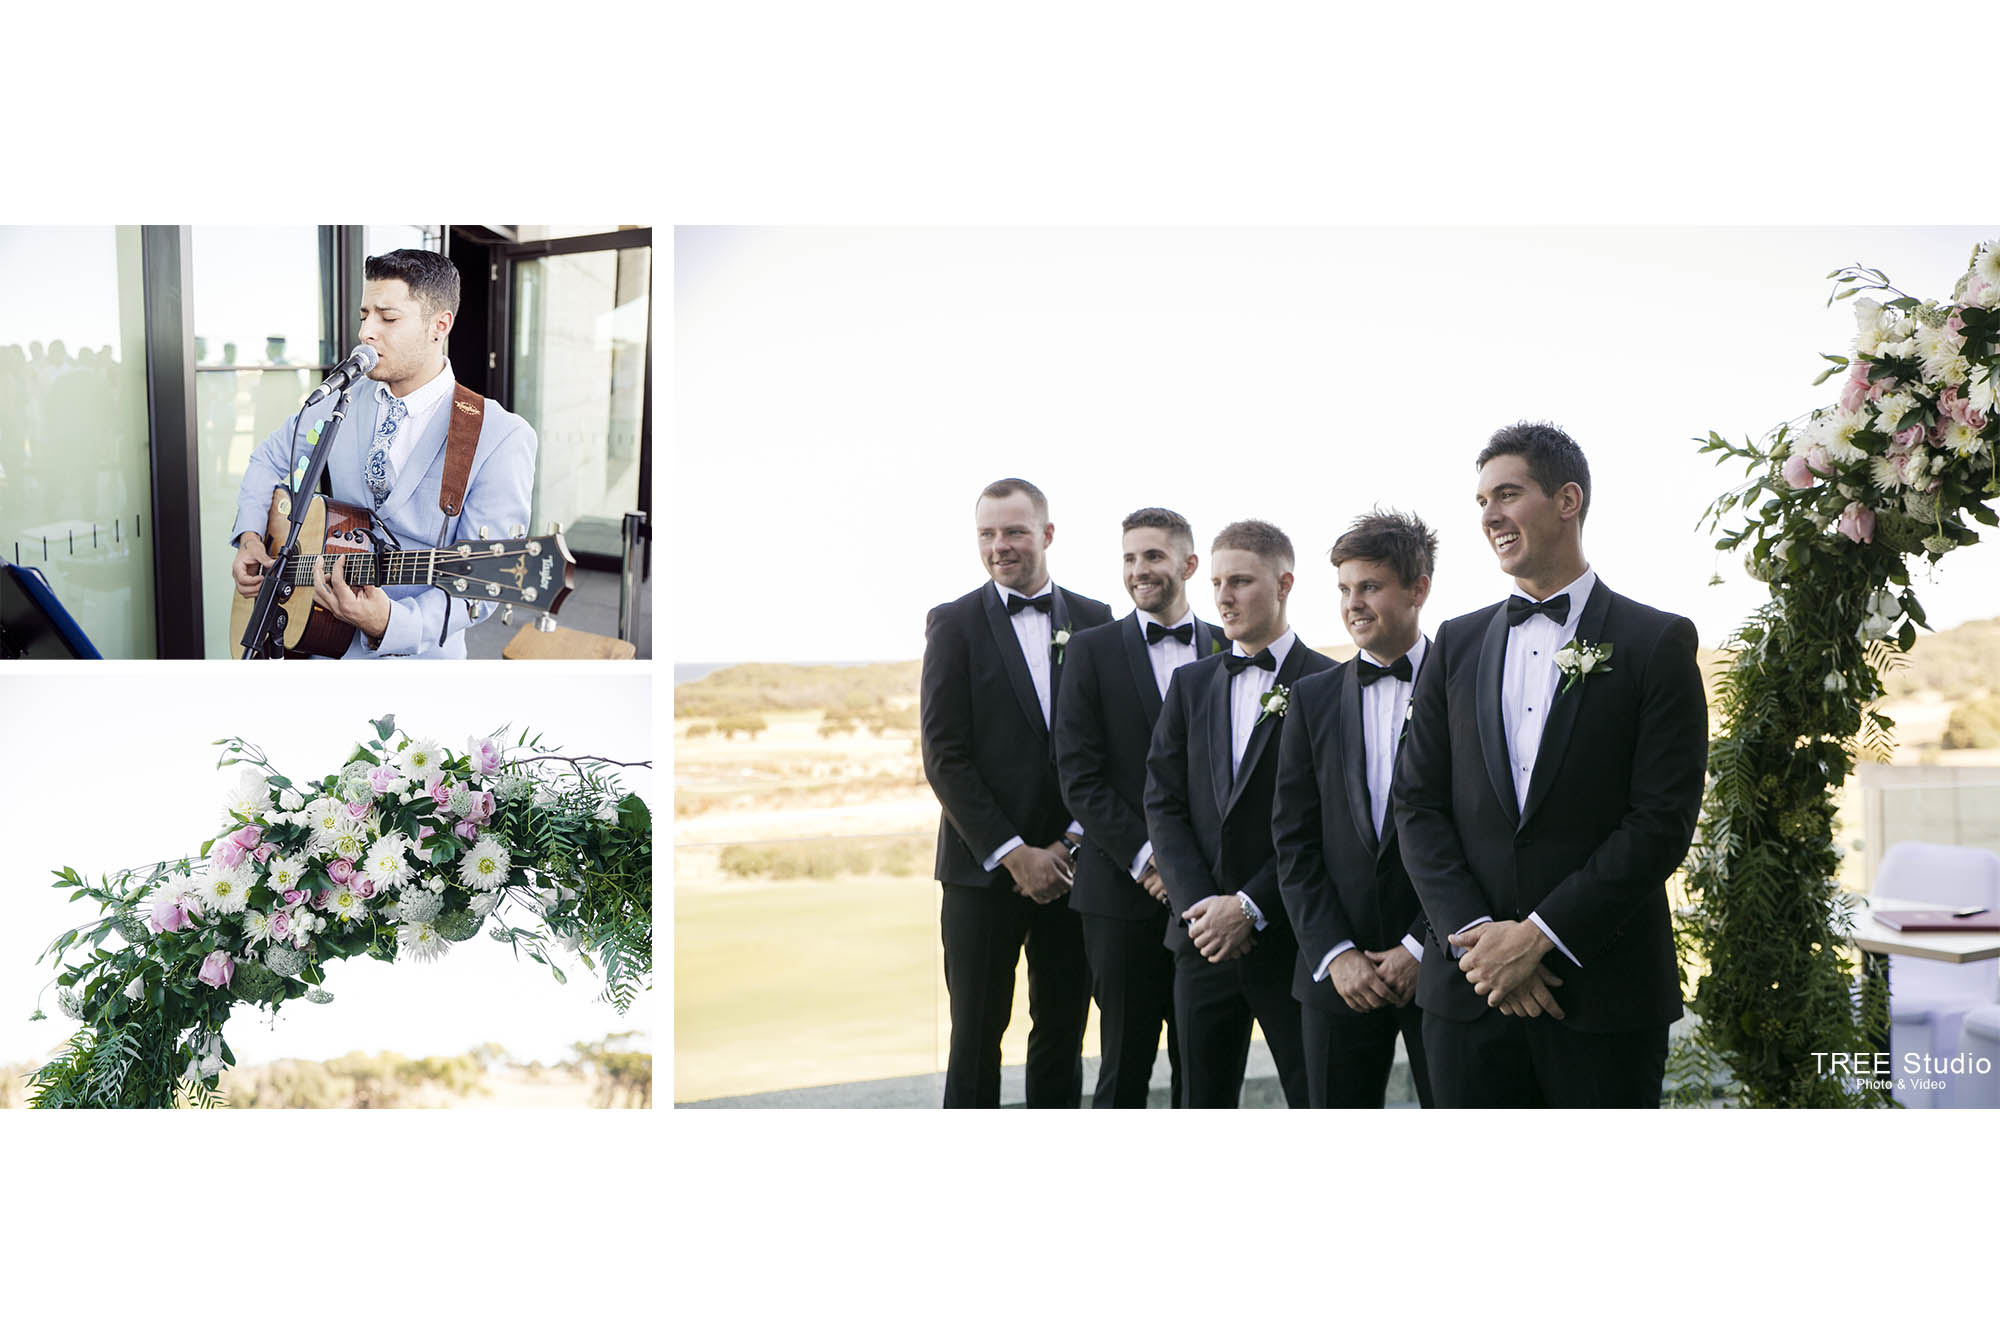 RACV Torquay Wedding Photography 17 - Karlie & Matt's Wedding Photography @ RACV Torquay Resort